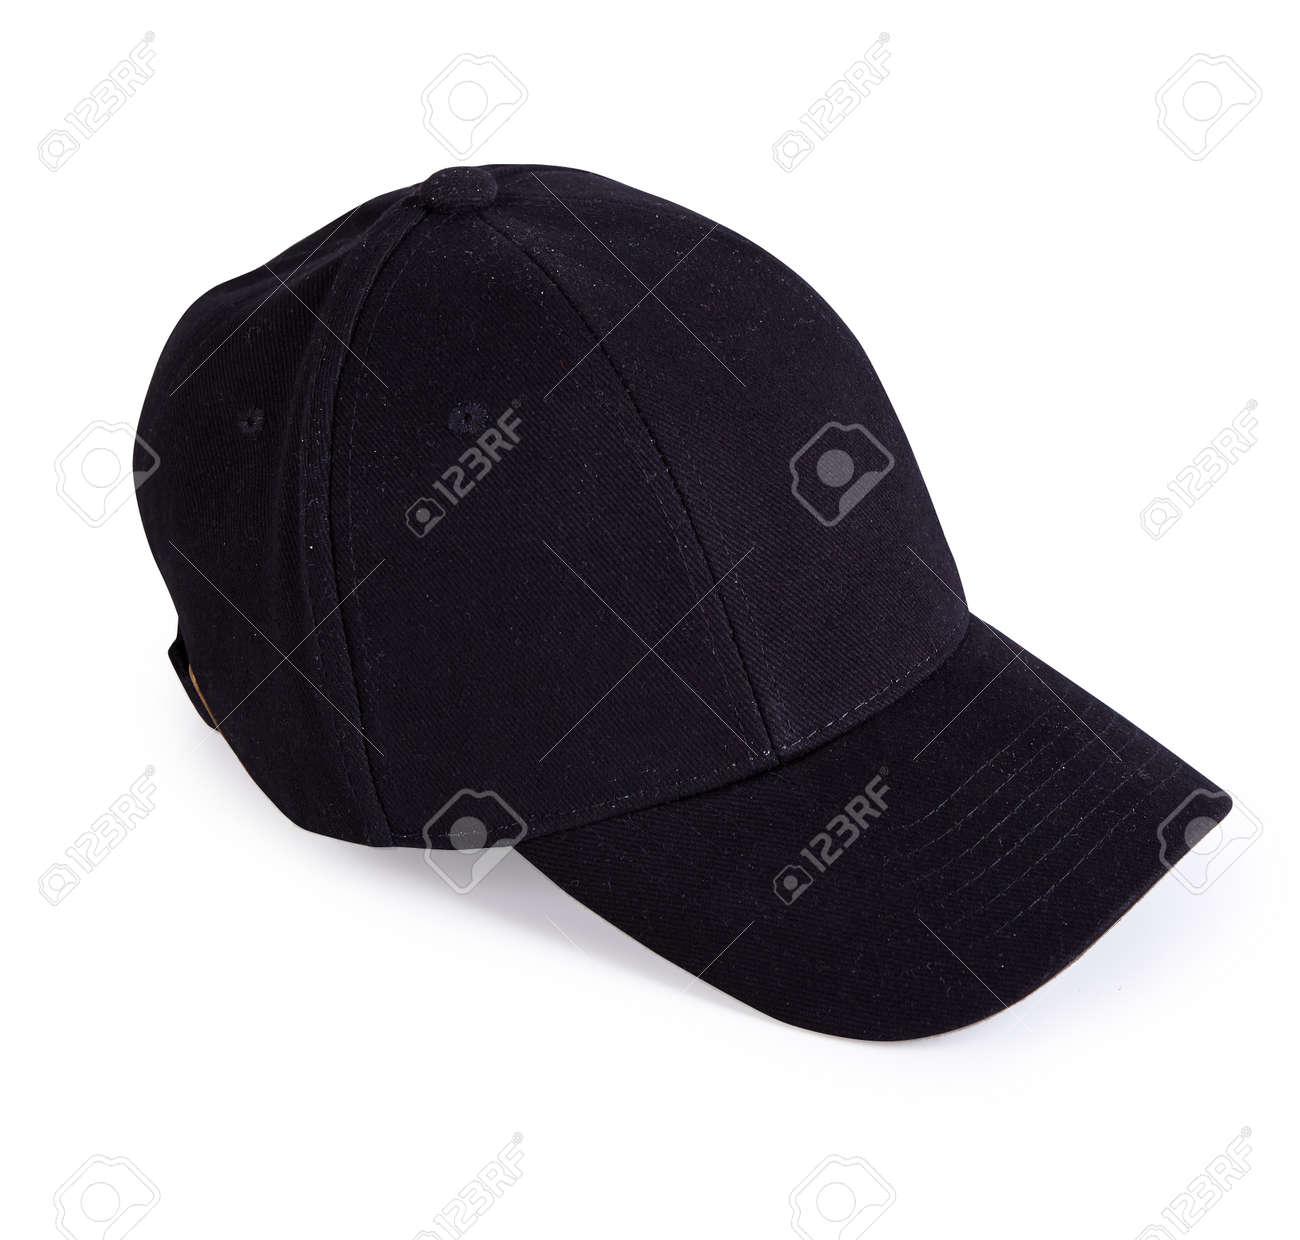 1eb10b35 Black Baseball Cap Isolated On White Background Stock Photo, Picture ...